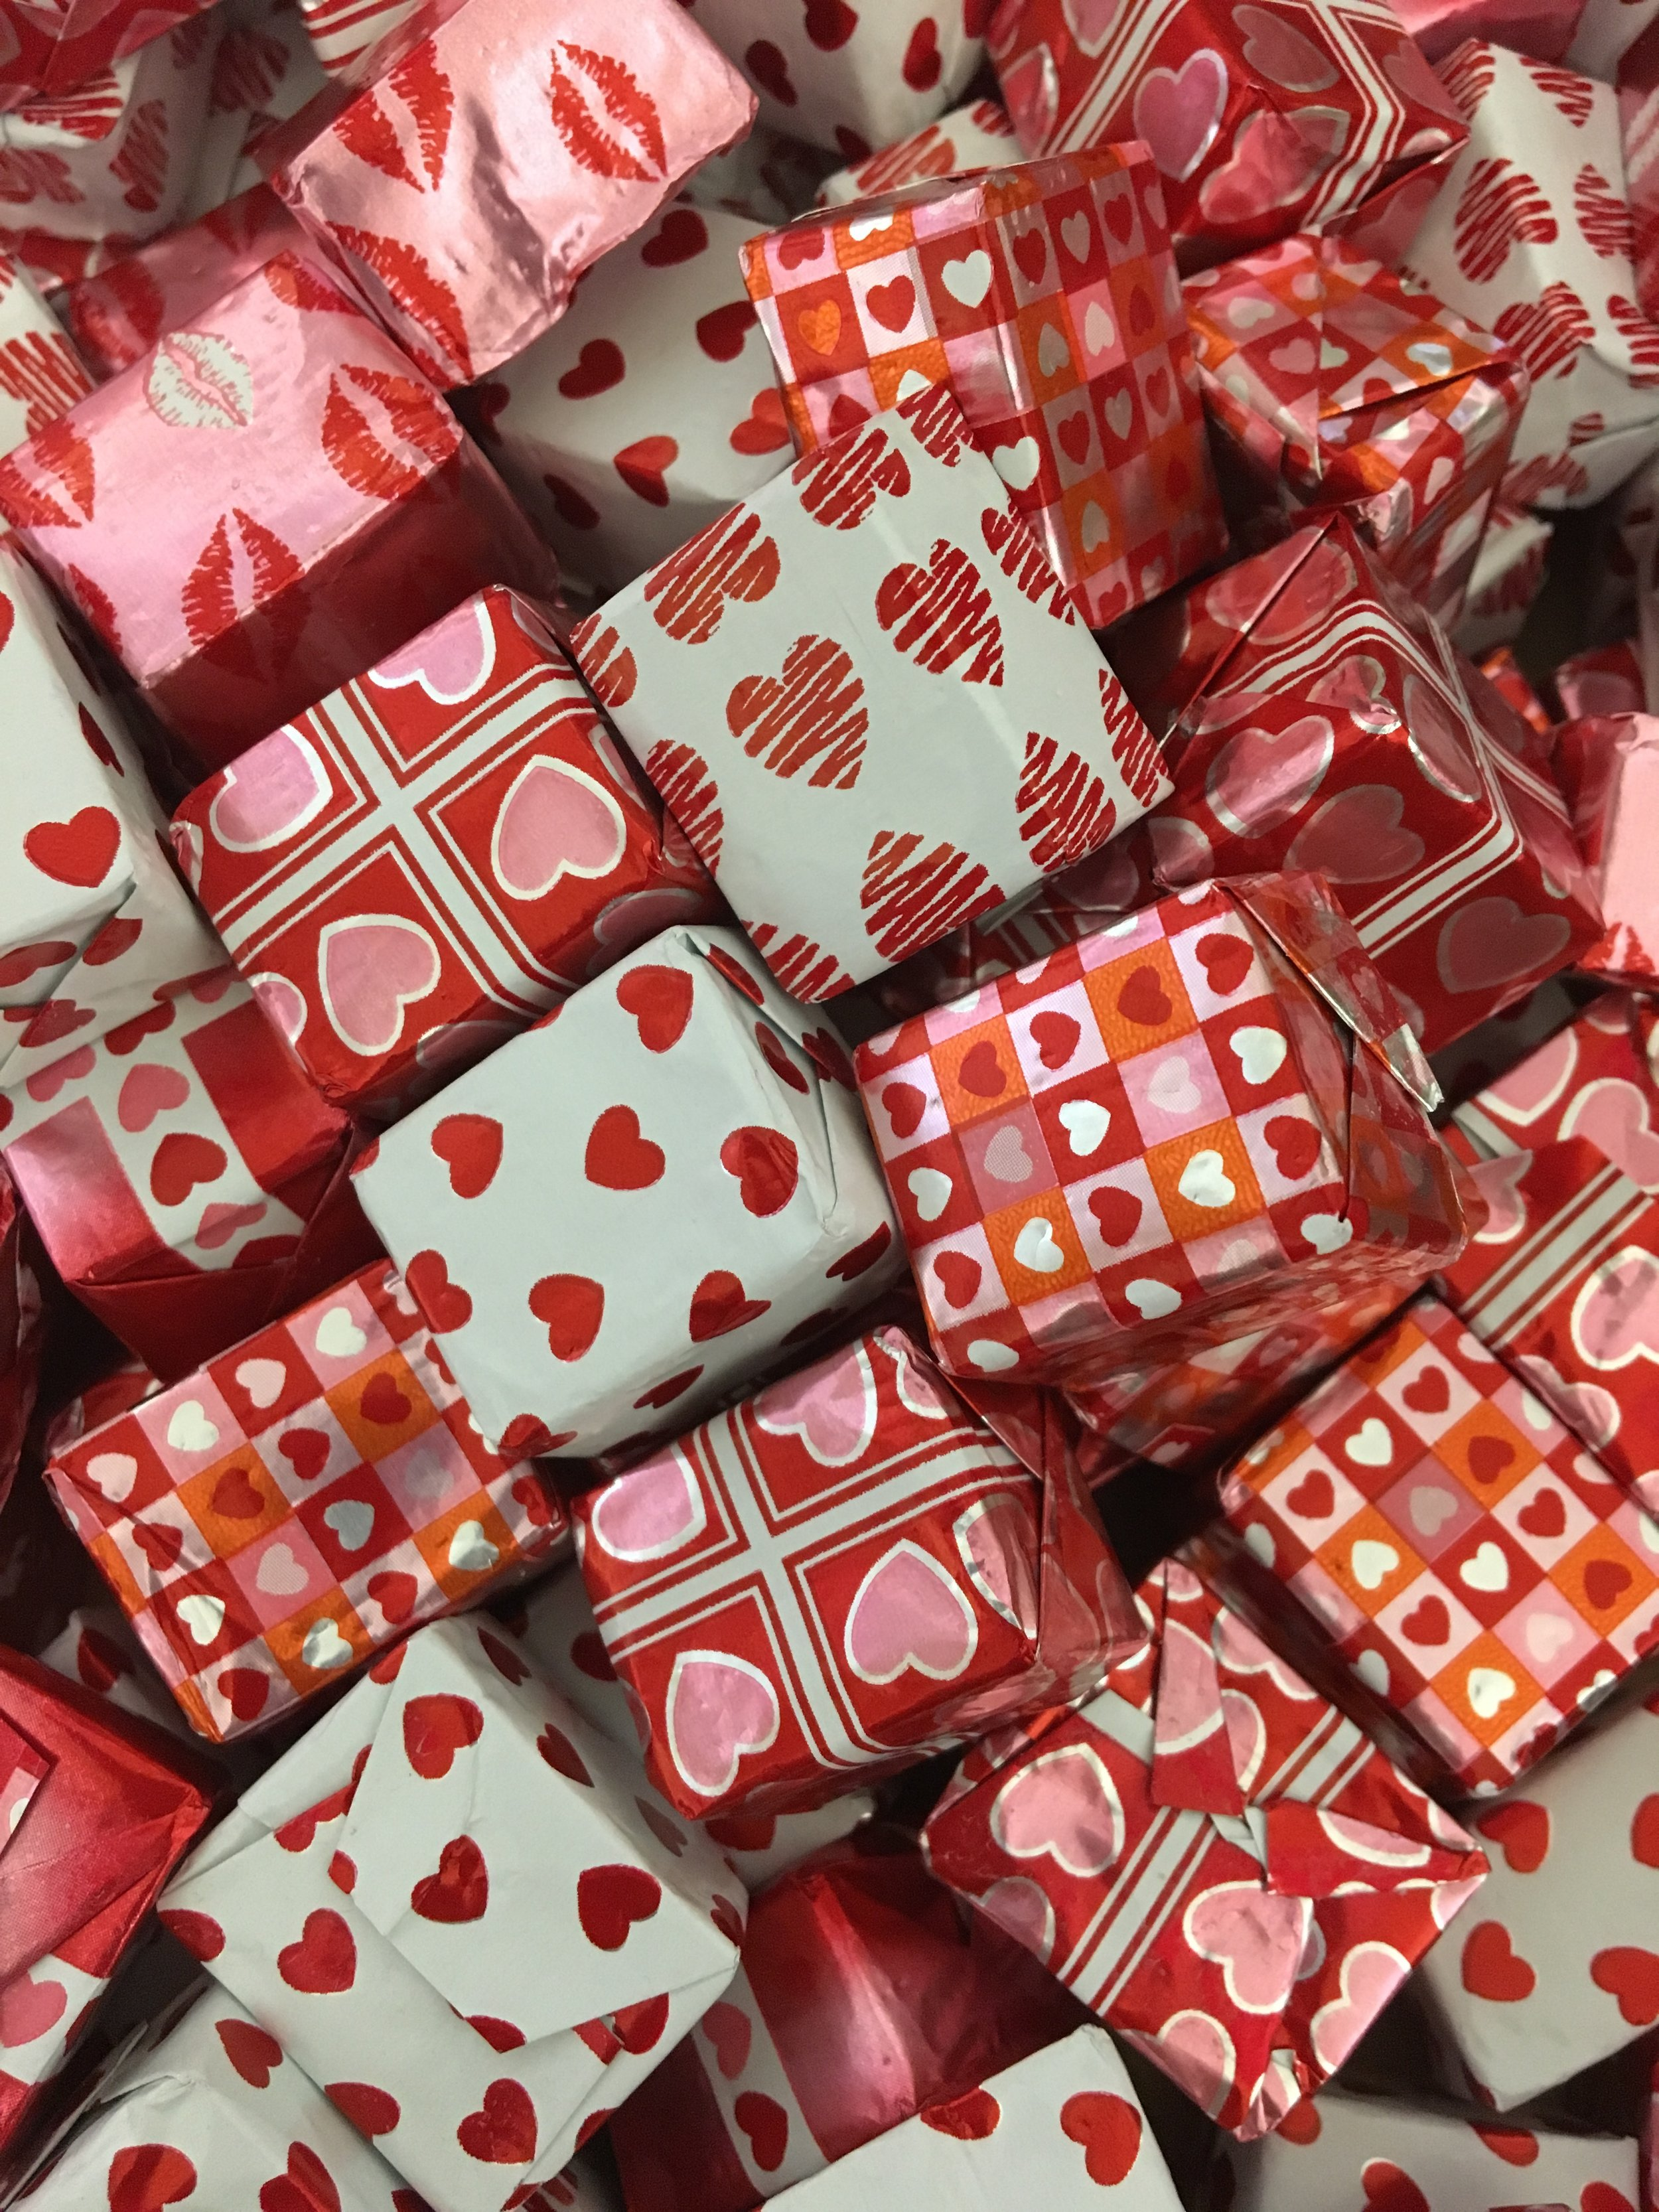 Valentine Presents   Available in milk chocolate    1 lb. - $14.95 1/2 lb. - $7.50 1/4 lb. - $3.75